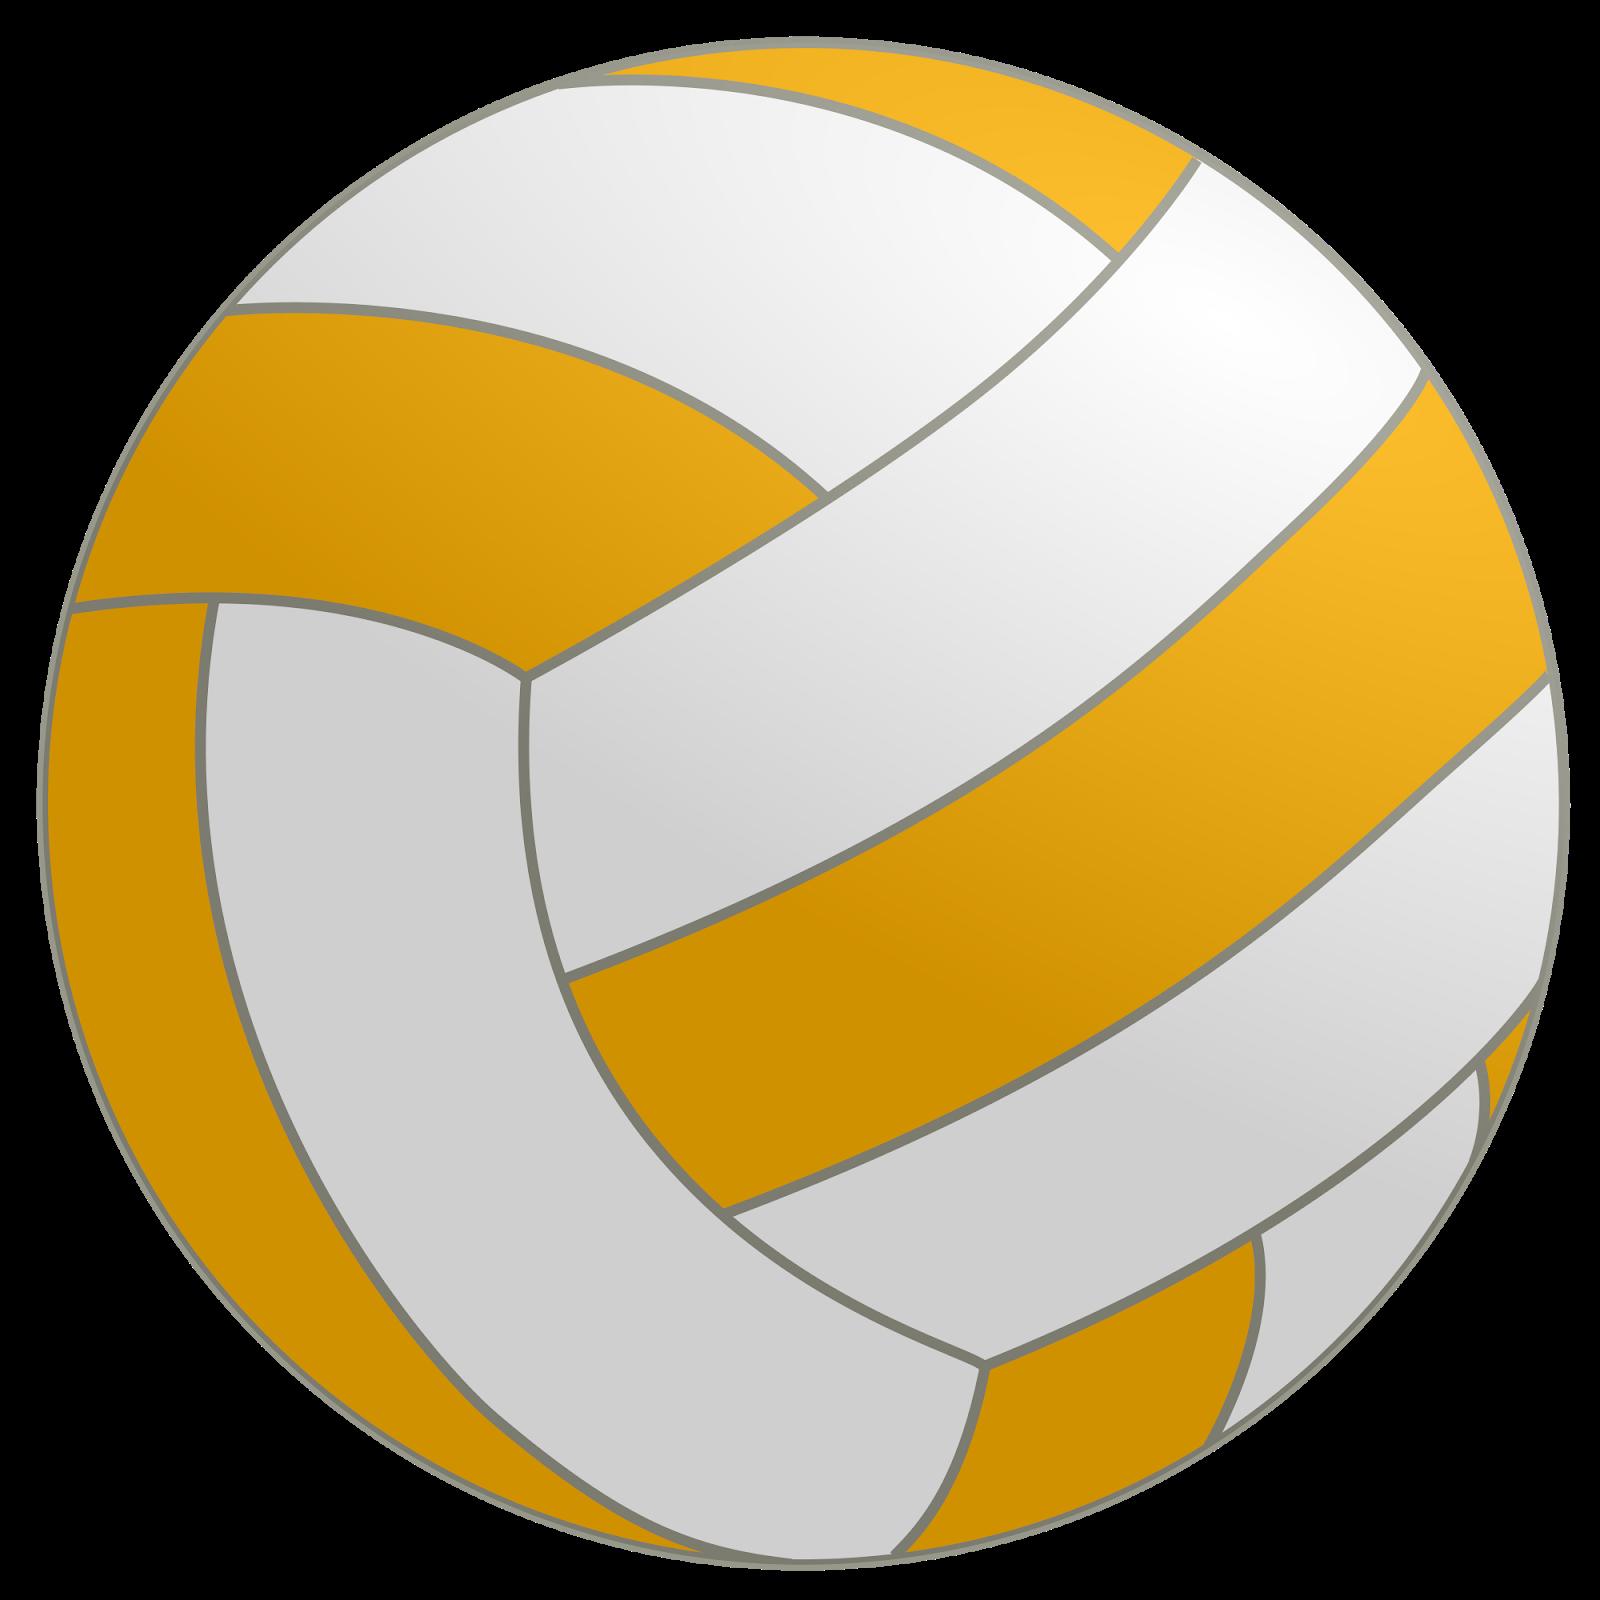 Cascade public schools cpsleadphoto. Volleyball clipart orange